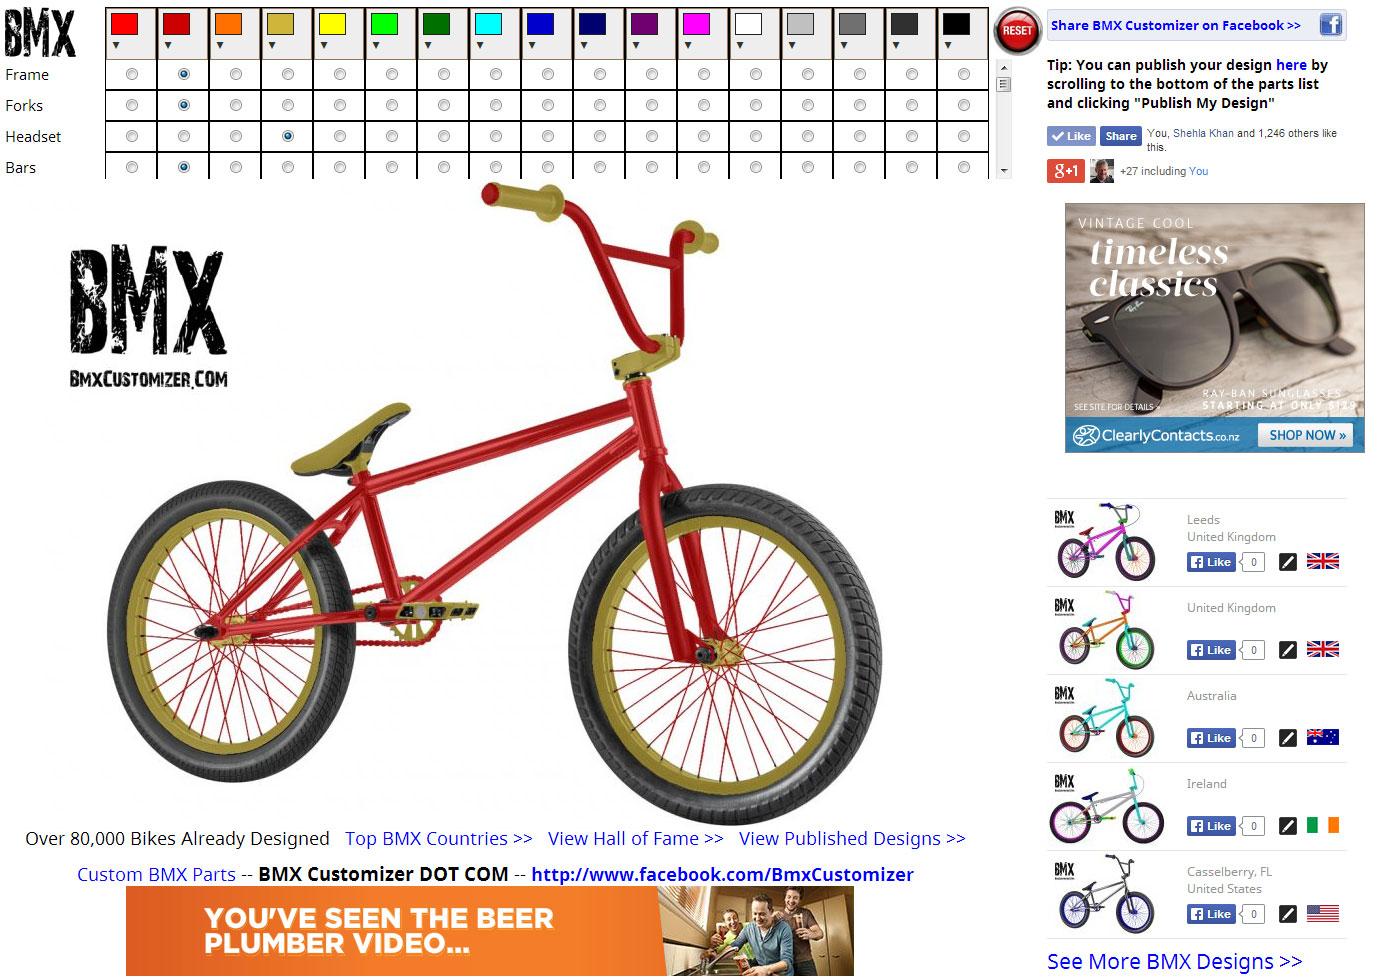 Design Your Own Bike Frame Online